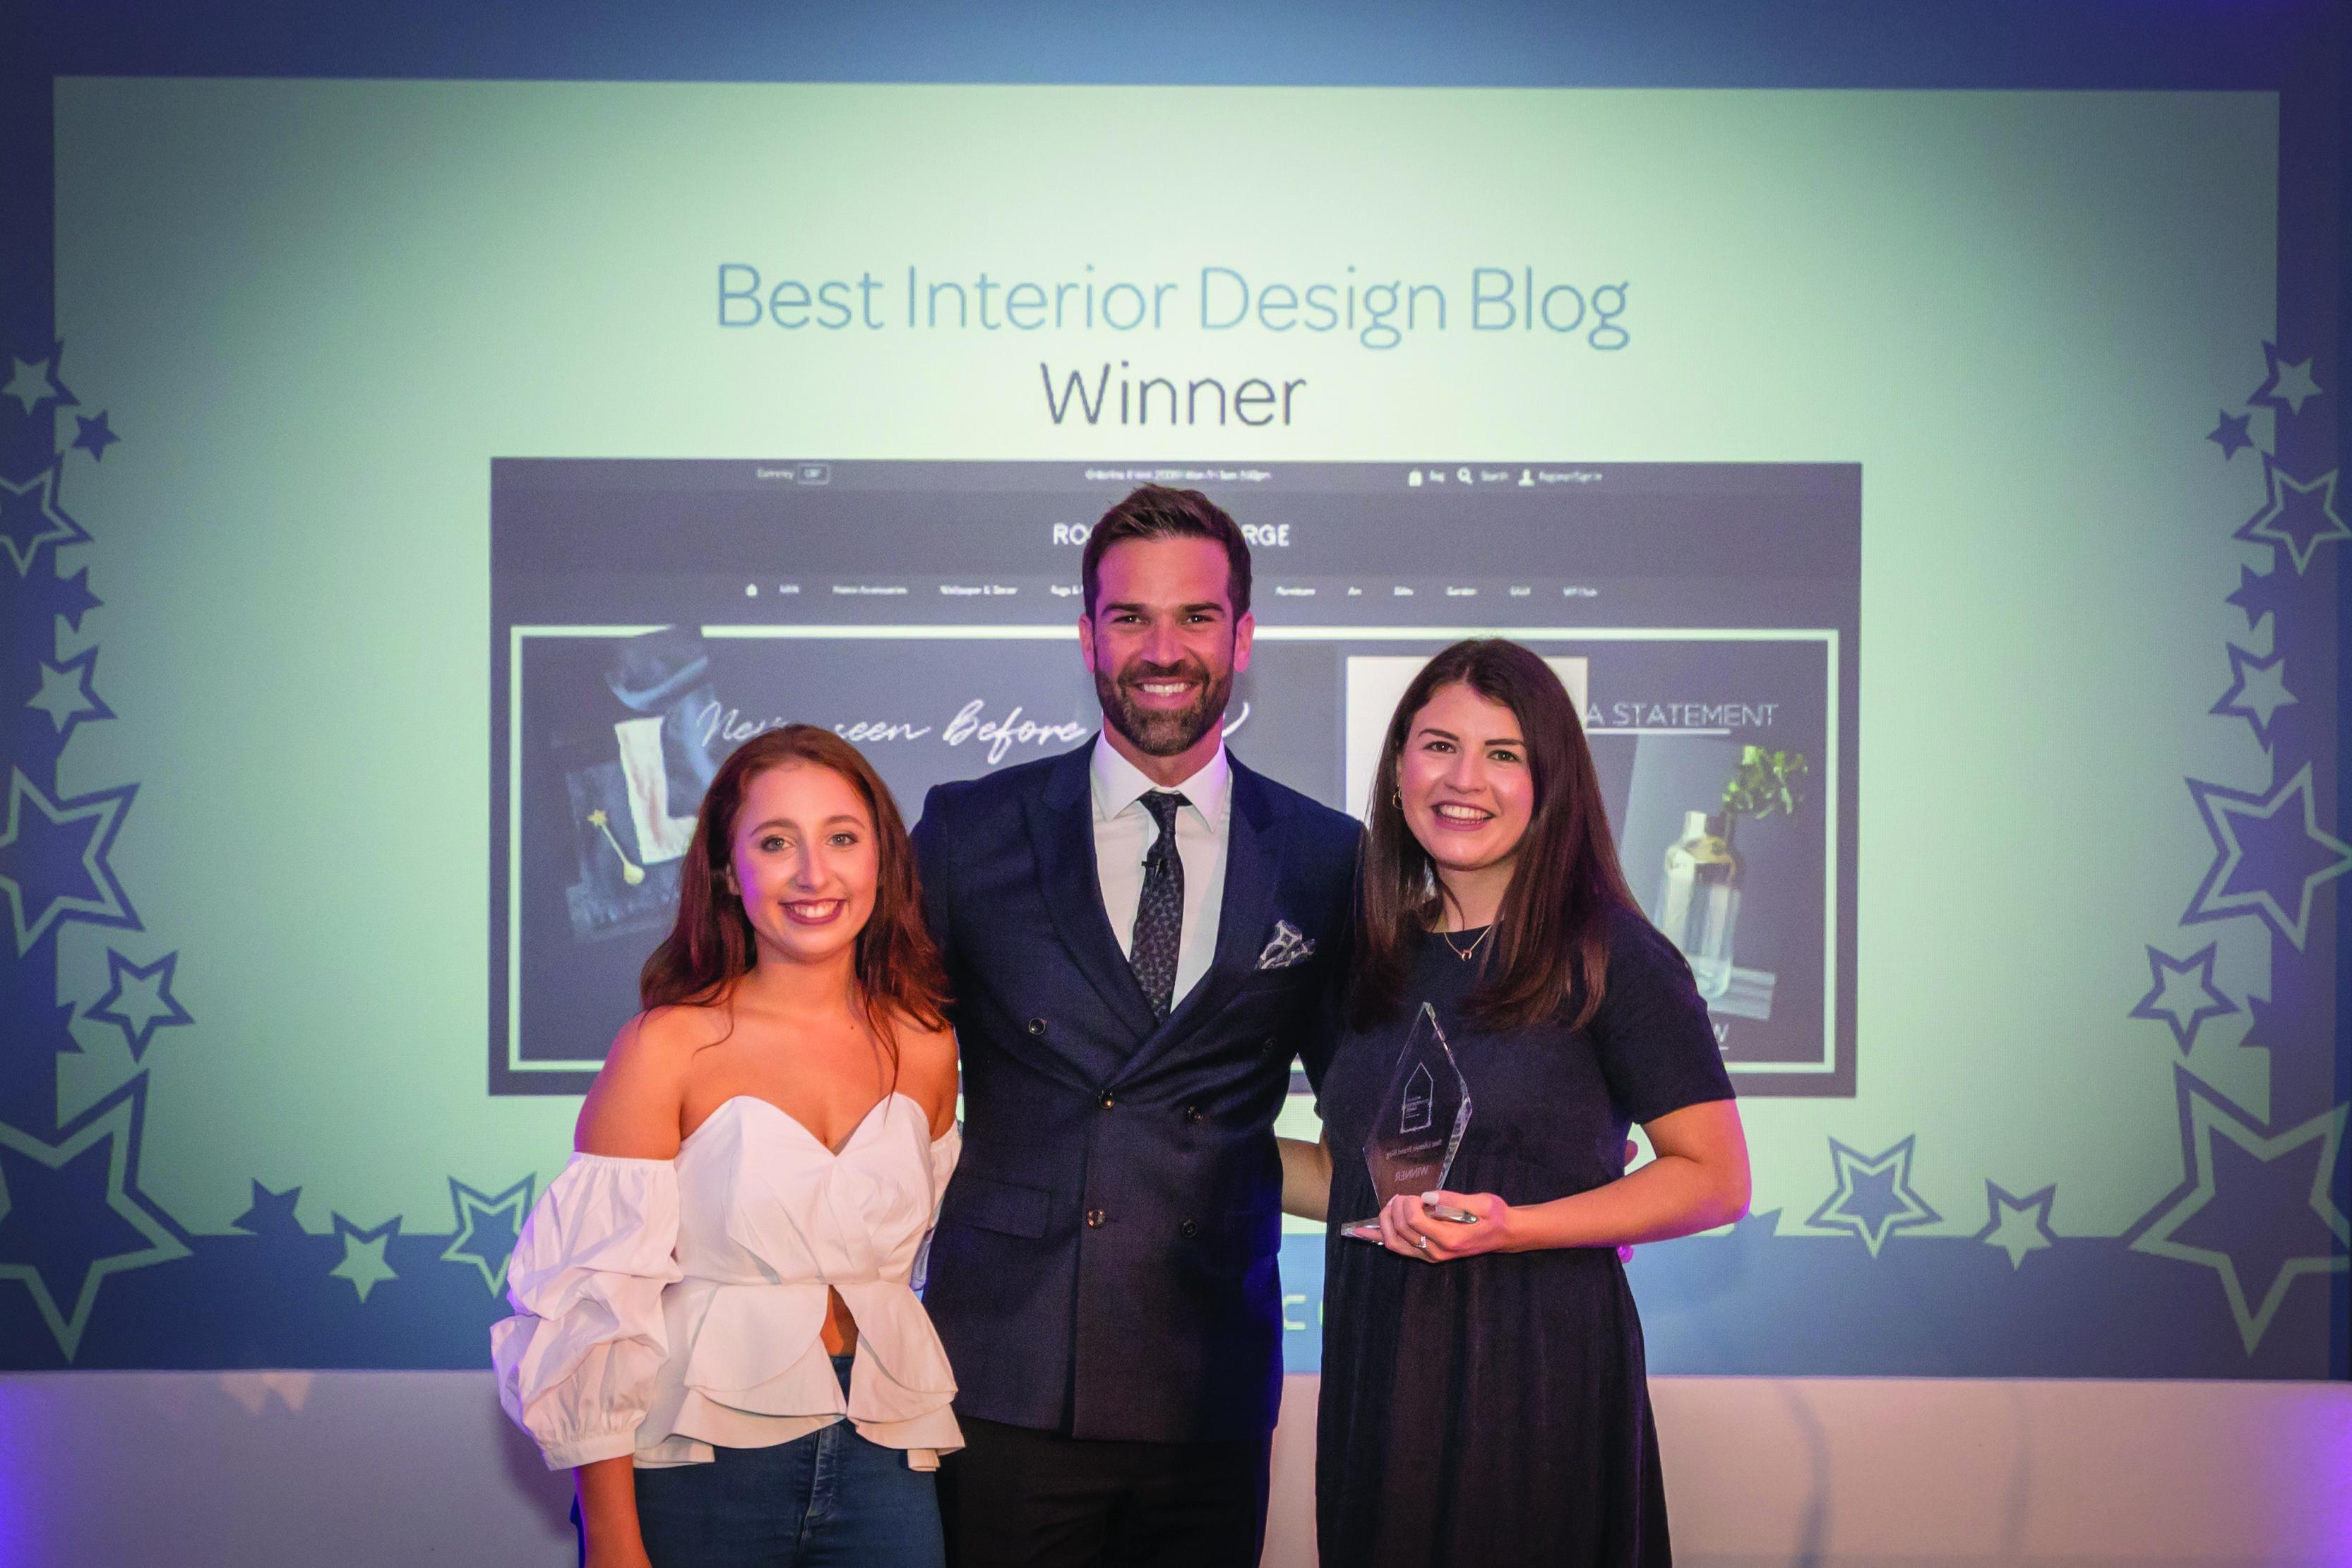 Rockett St George Award Winning Blog